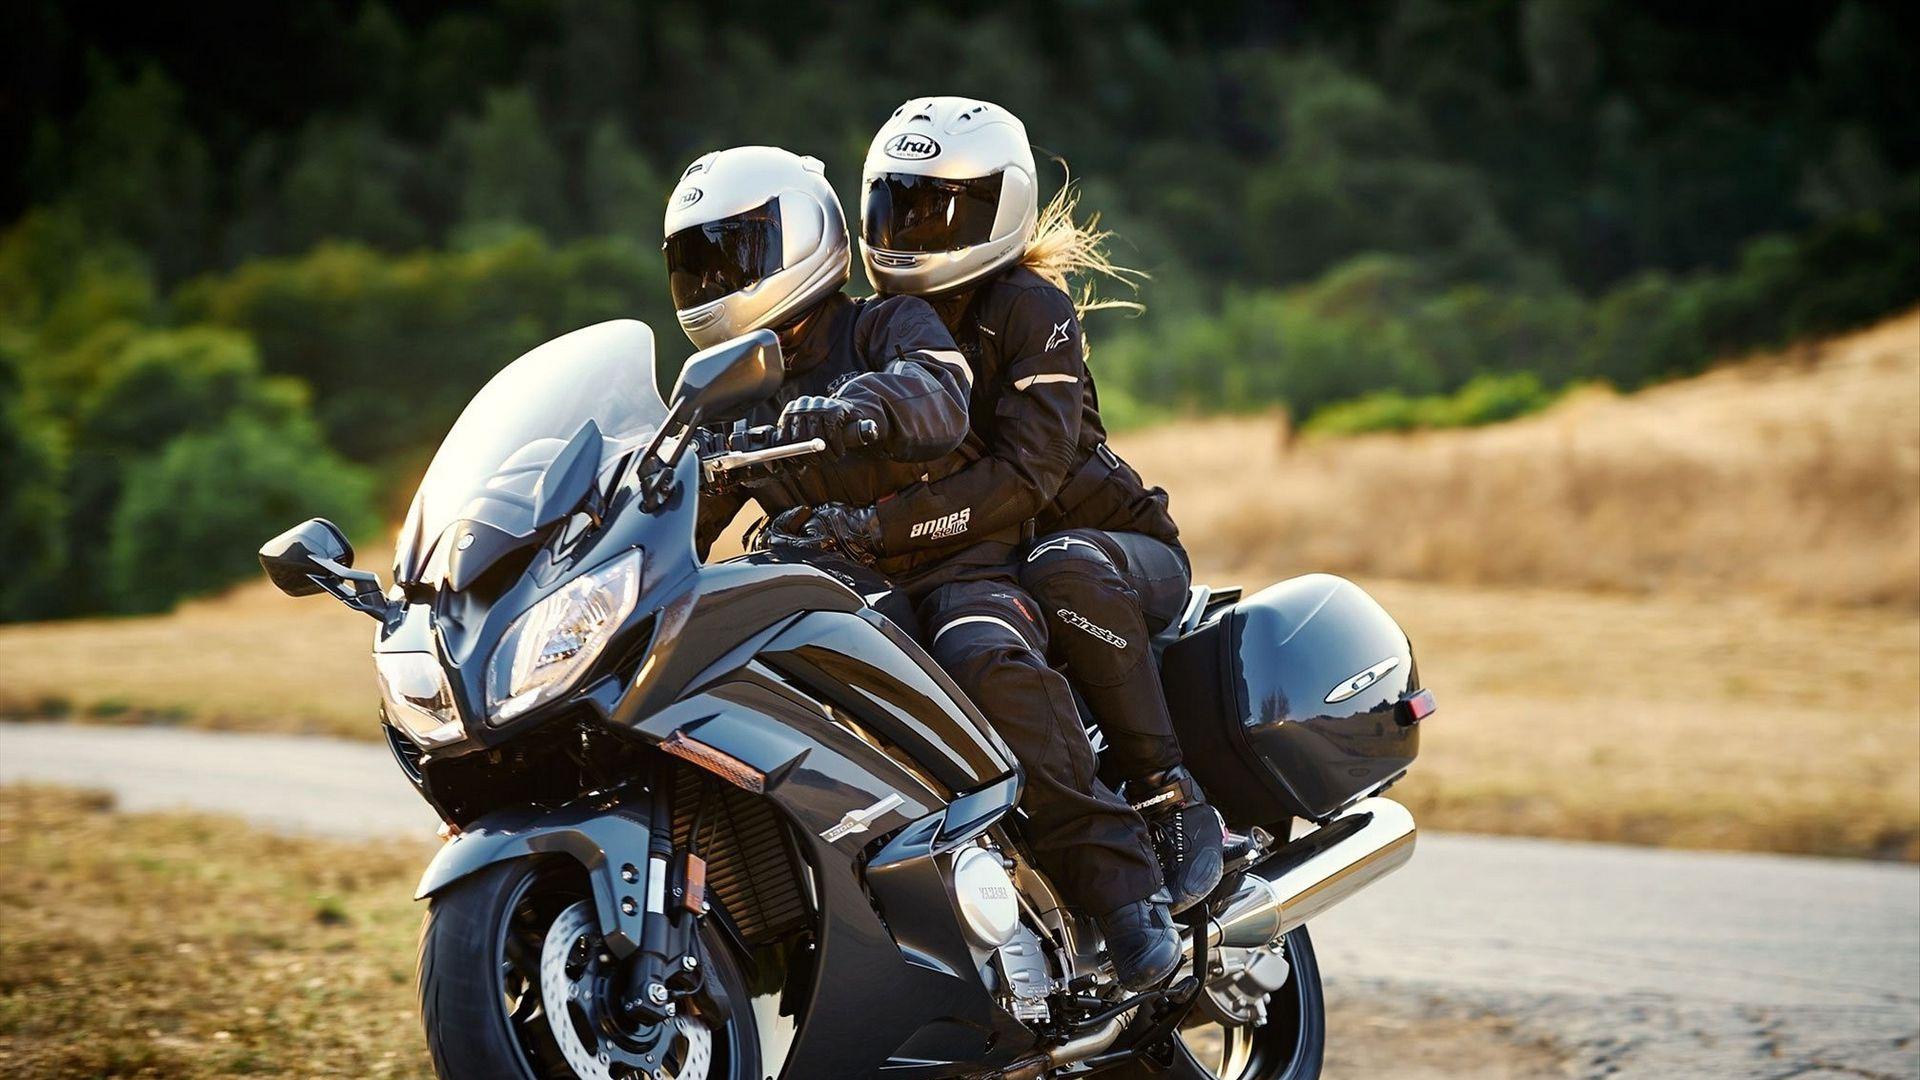 2015 Yamaha, Fjr1300es, Sports Turn Wallpapers Free Download